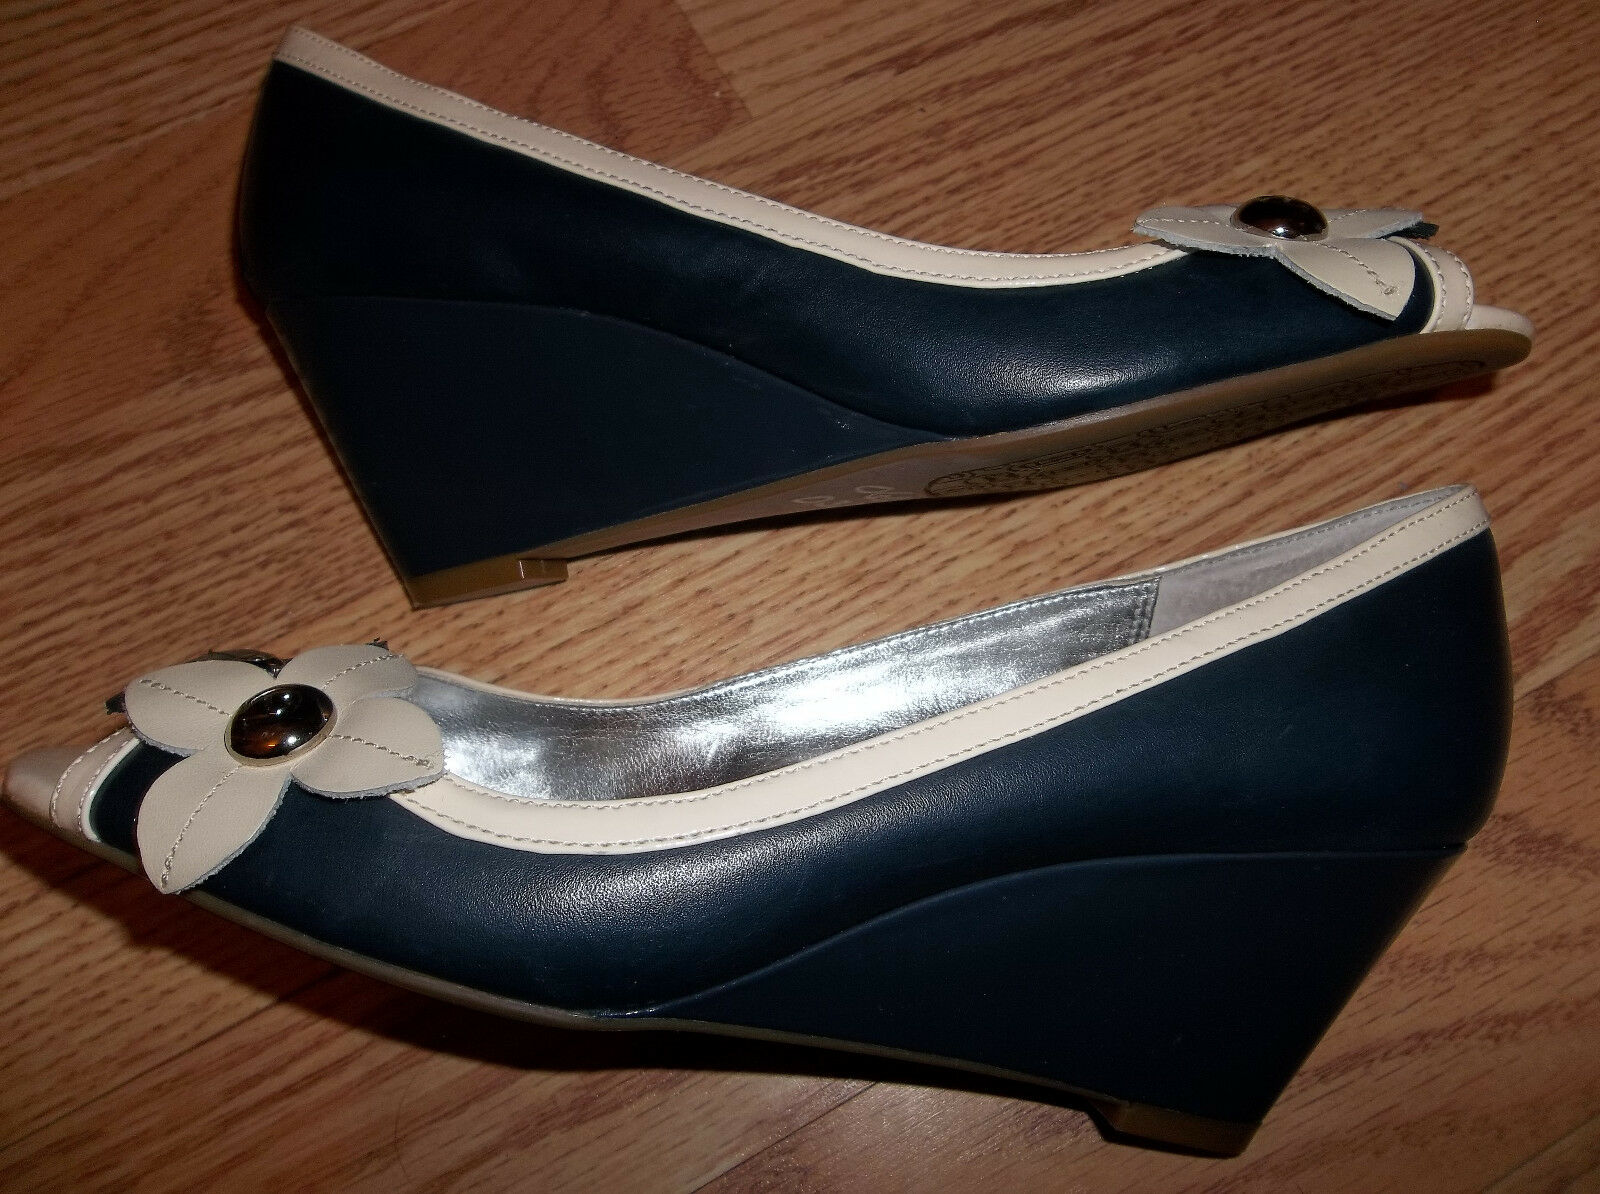 Etienne Aigner Pacific damen Größe 6m 6m 6m Leather Wedges Heels schuhe No Box 447962